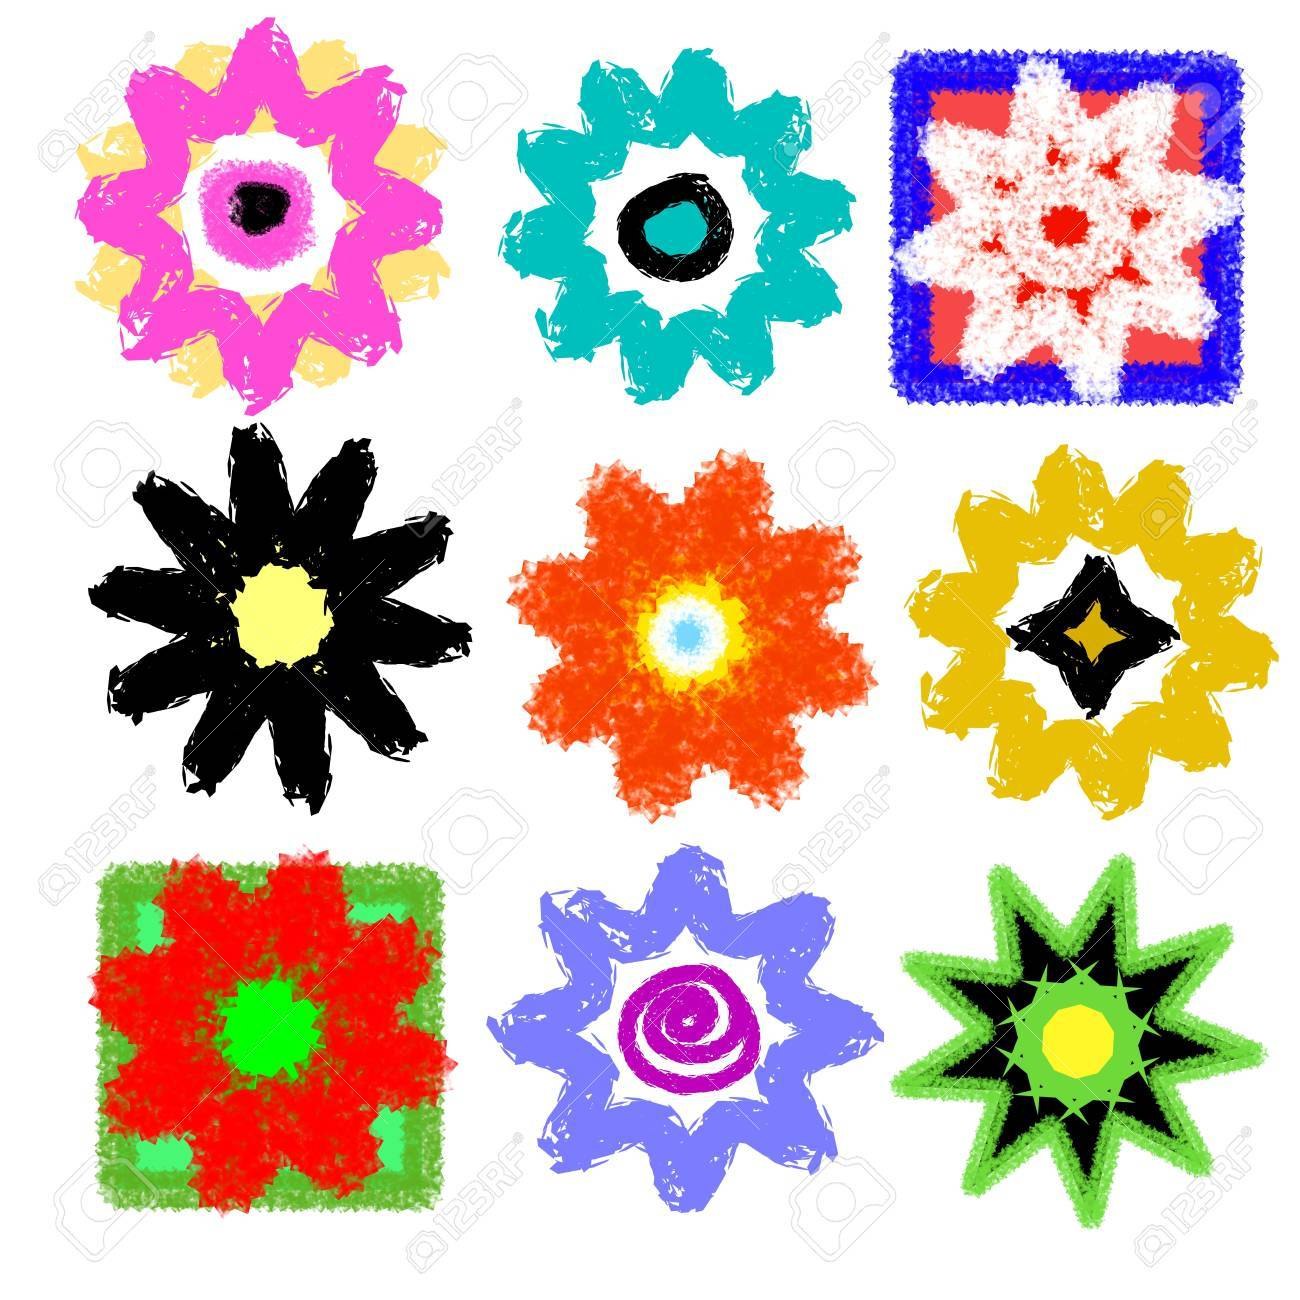 Grunge Flower Power Set, High Resolution Stock Photo - 5429787